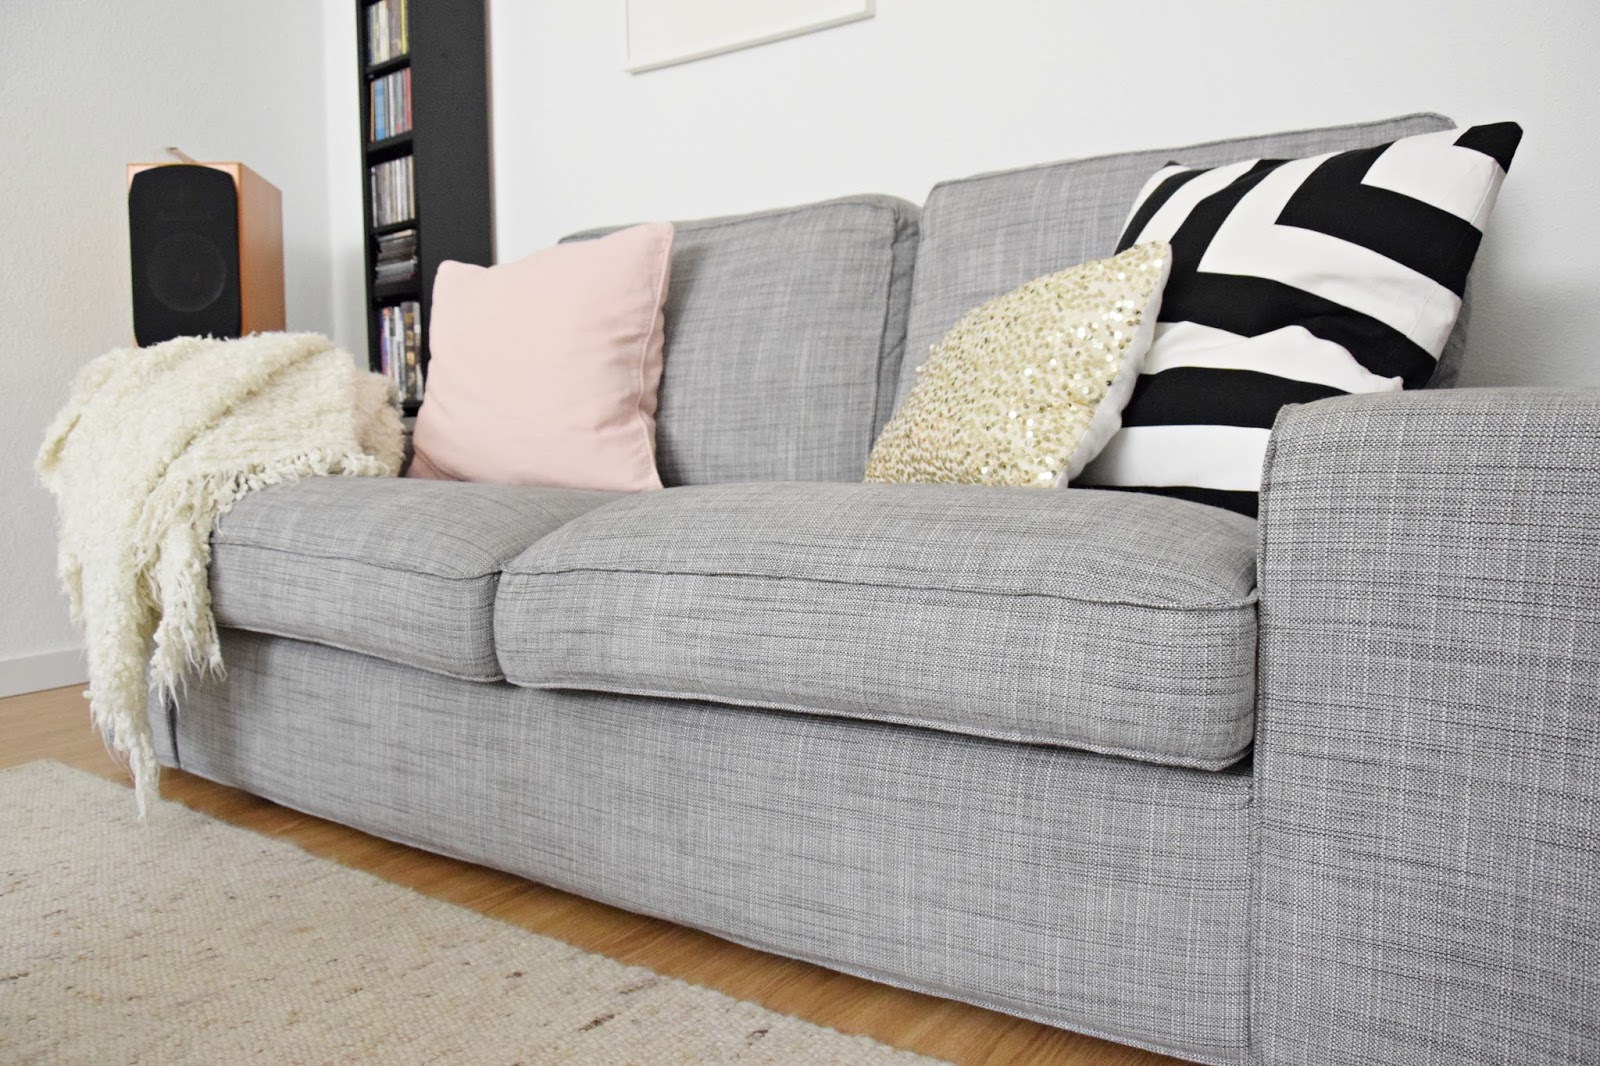 sofa ikea kivik opiniones bed london uk   brokeasshome.com